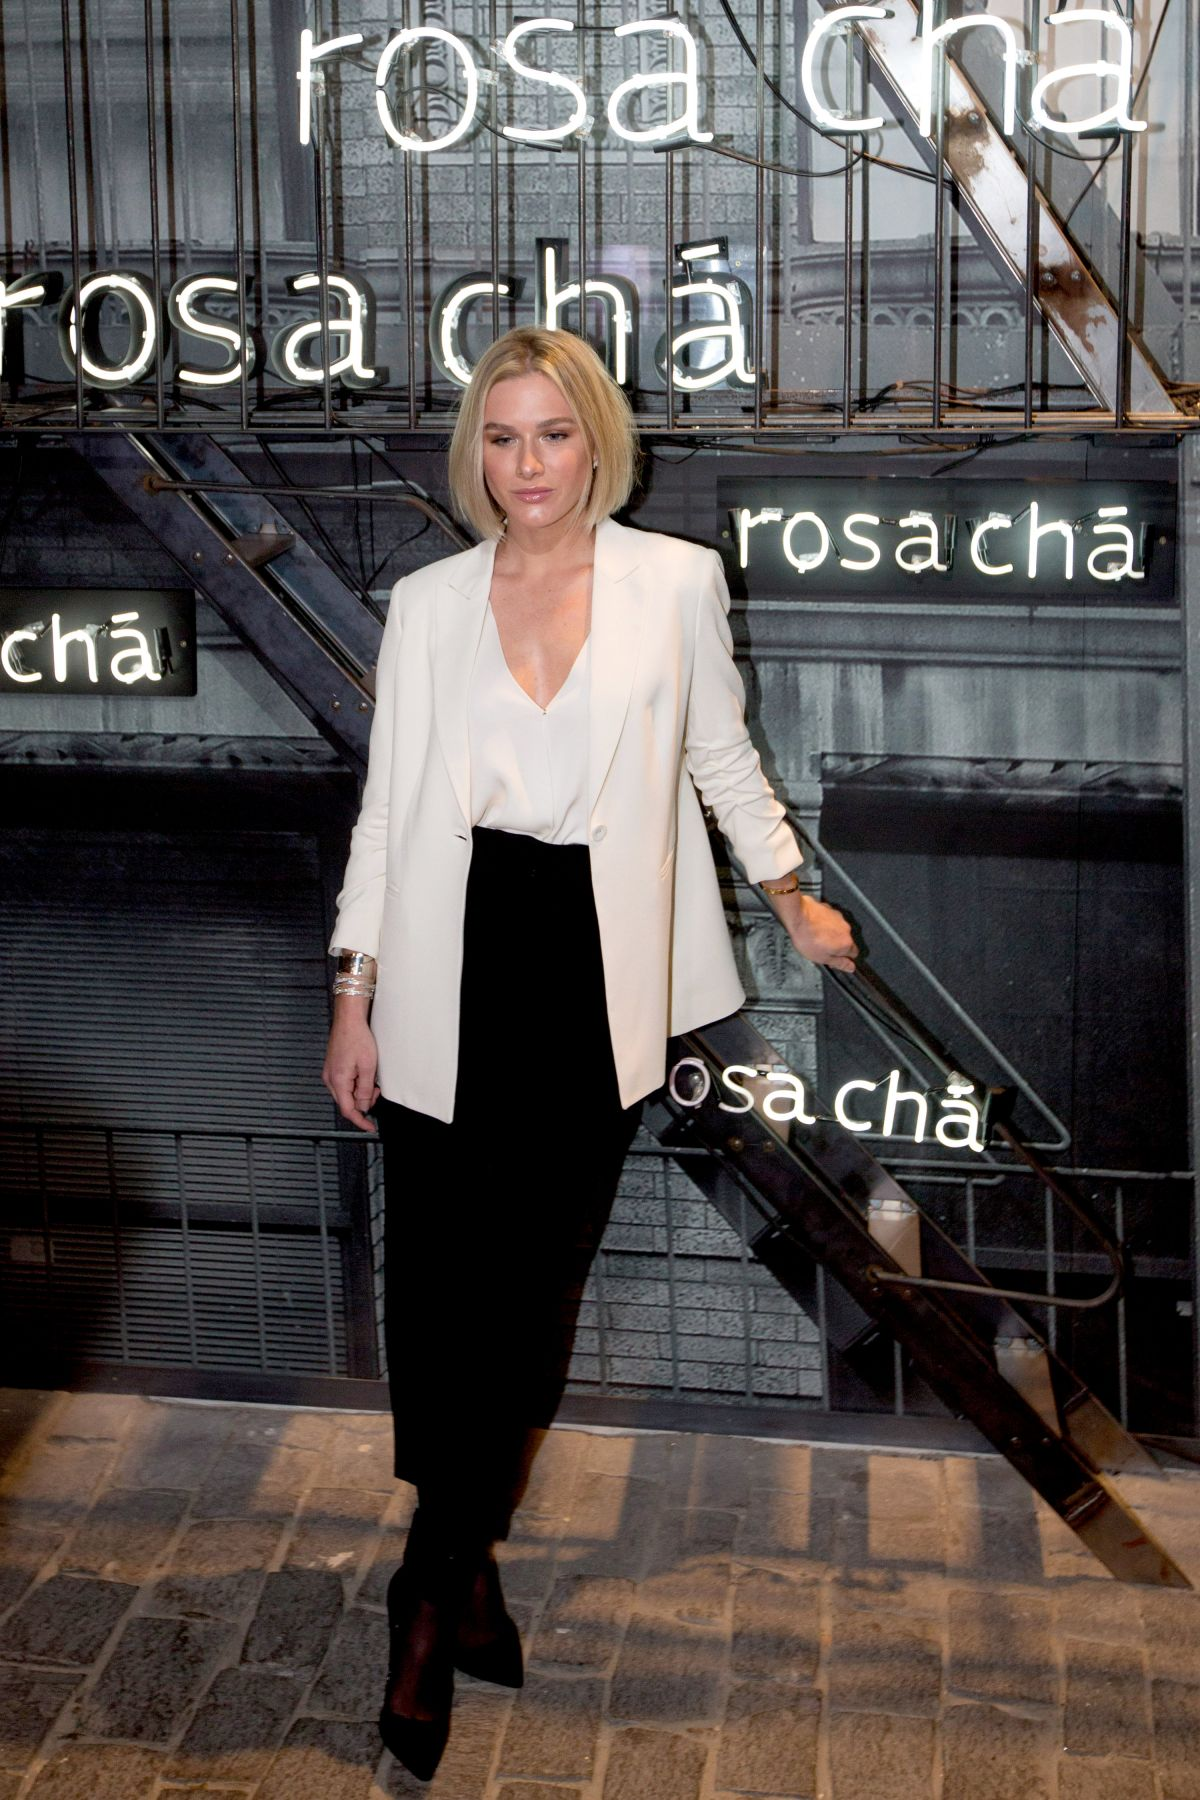 FIORELLA MATTHEIS at Rosa Cha Summer Collection Lauch in Sao Paulo 08/16/2017